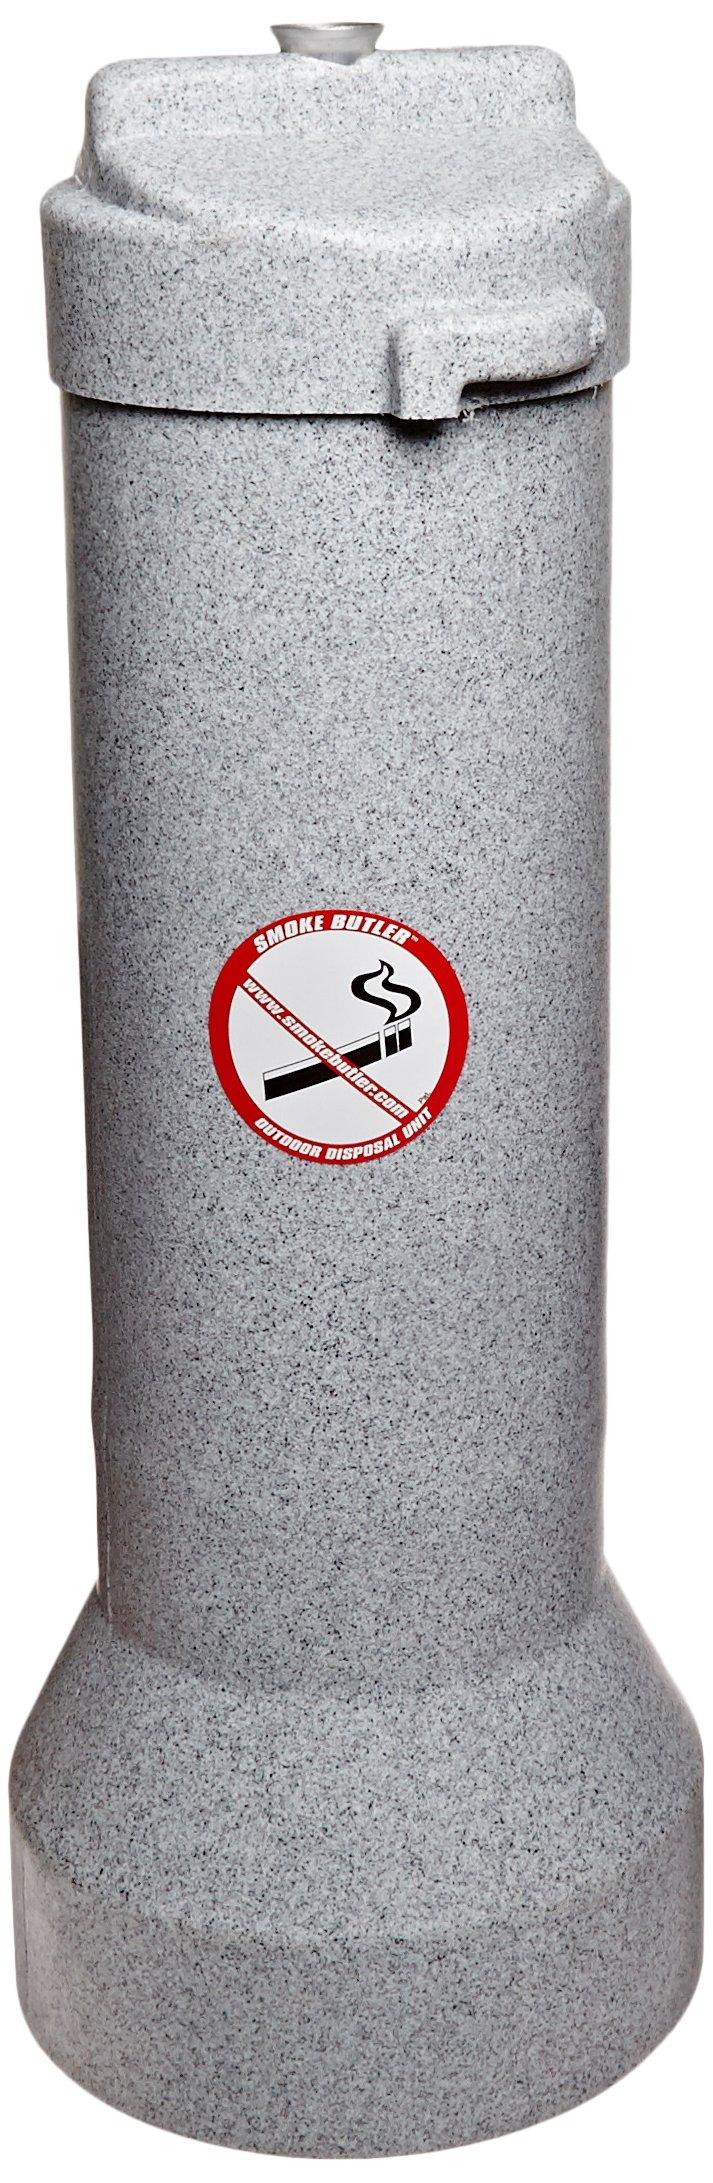 Impact 4450 The Butler Outdoor Smoker's Receptacle, 9'' Diameter x 25'' Height, Gray Granite